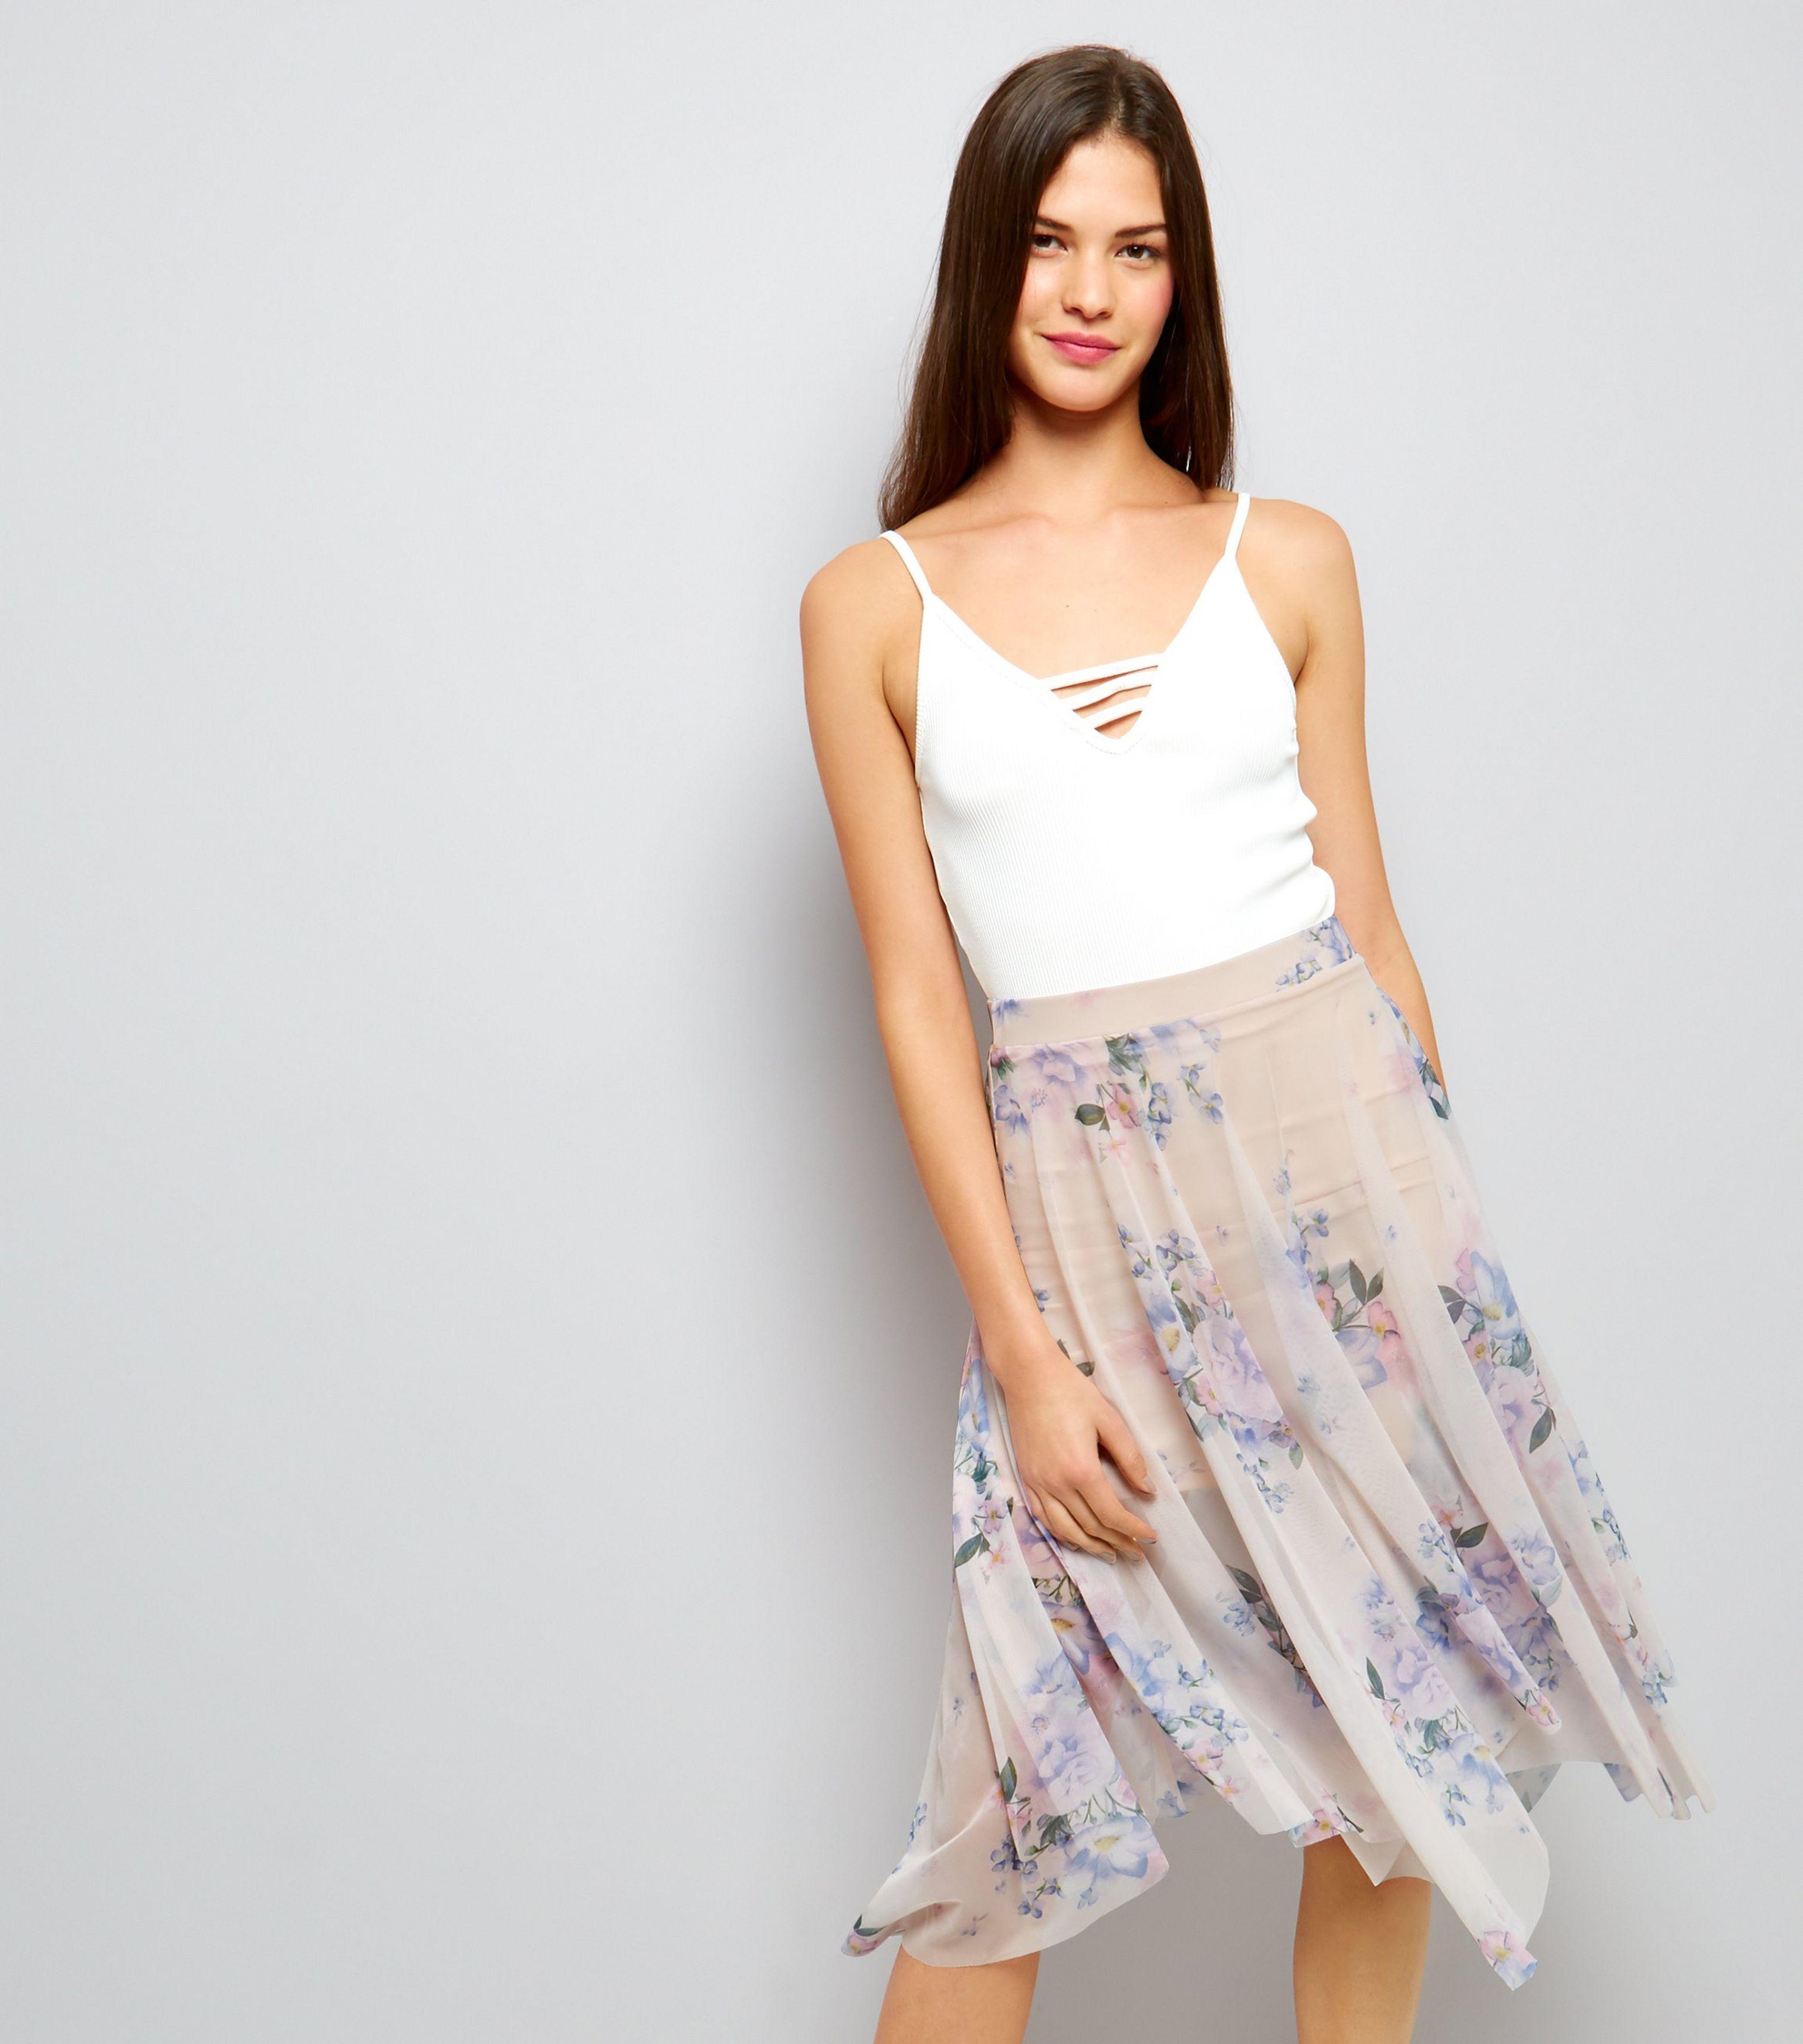 2e8da45c7 New Look Pink Floral Print Hanky Hem Mesh Skirt in Pink - Lyst